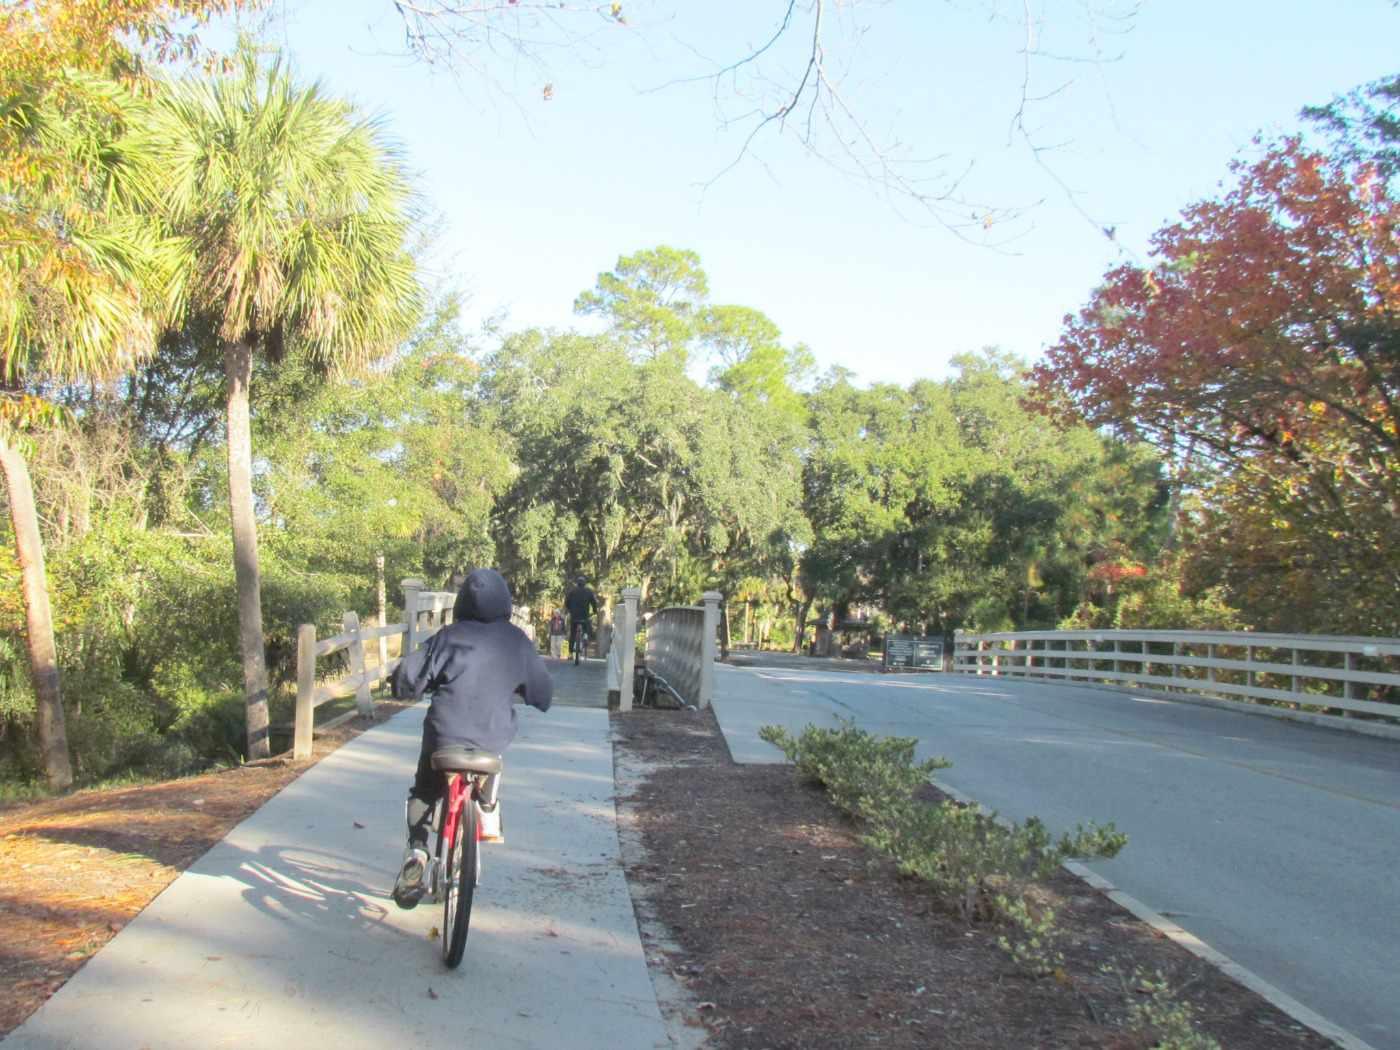 Bike paths at Palmetto Dunes Oceanfront Resort